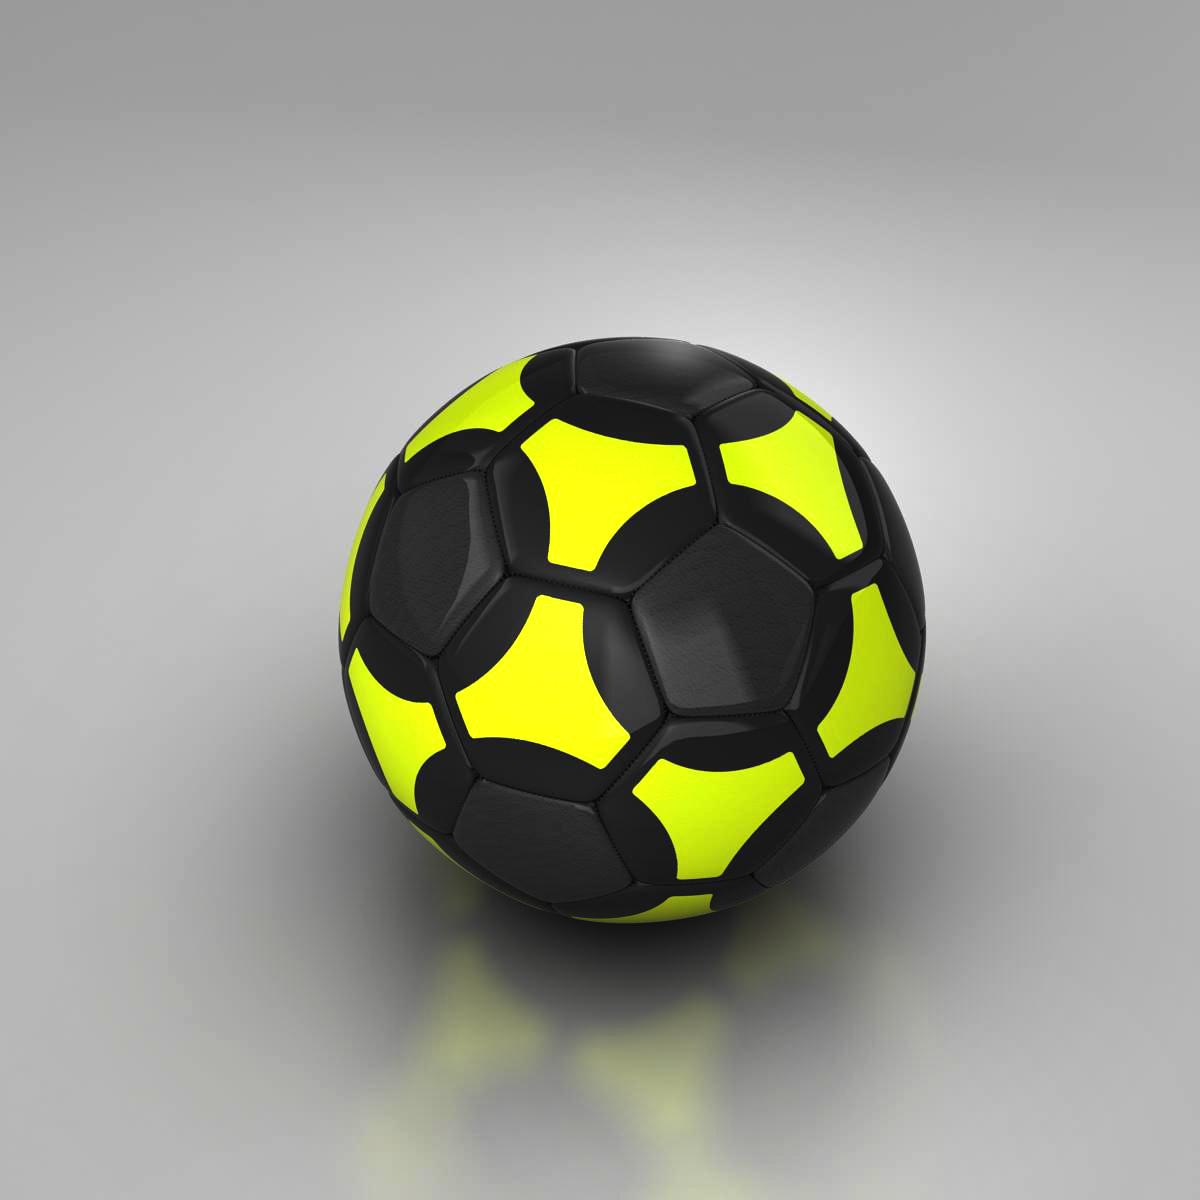 soccerball black yellow 3d model 3ds max fbx c4d ma mb obj 204207